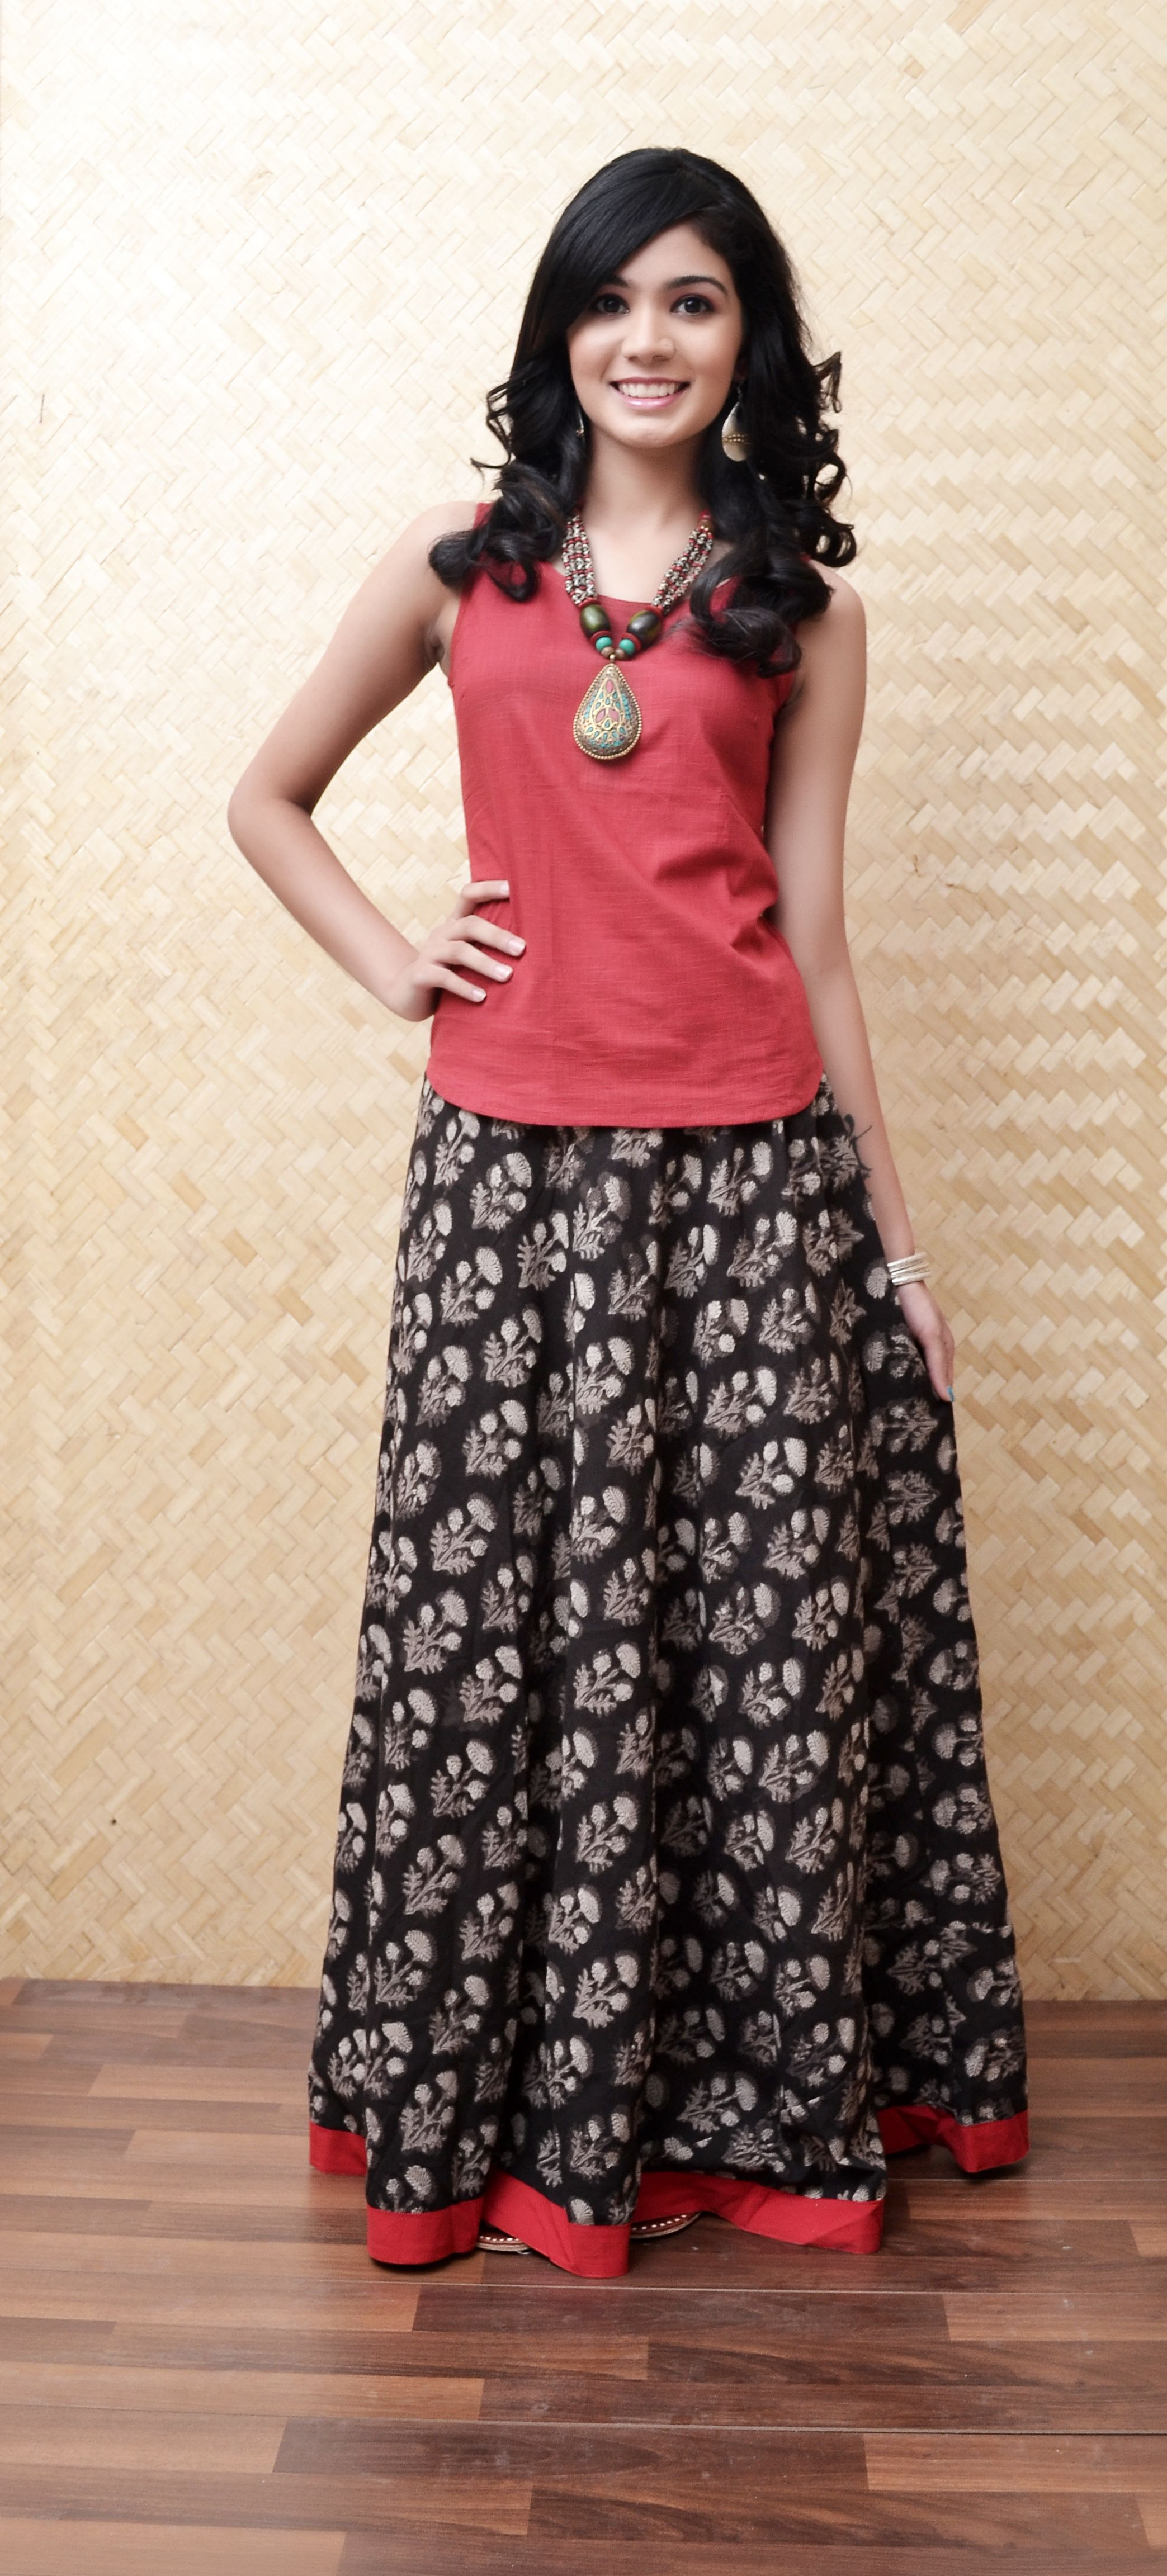 c61b4e4181 Different colours to wear. Red | University Diaries | Kalamkari ...